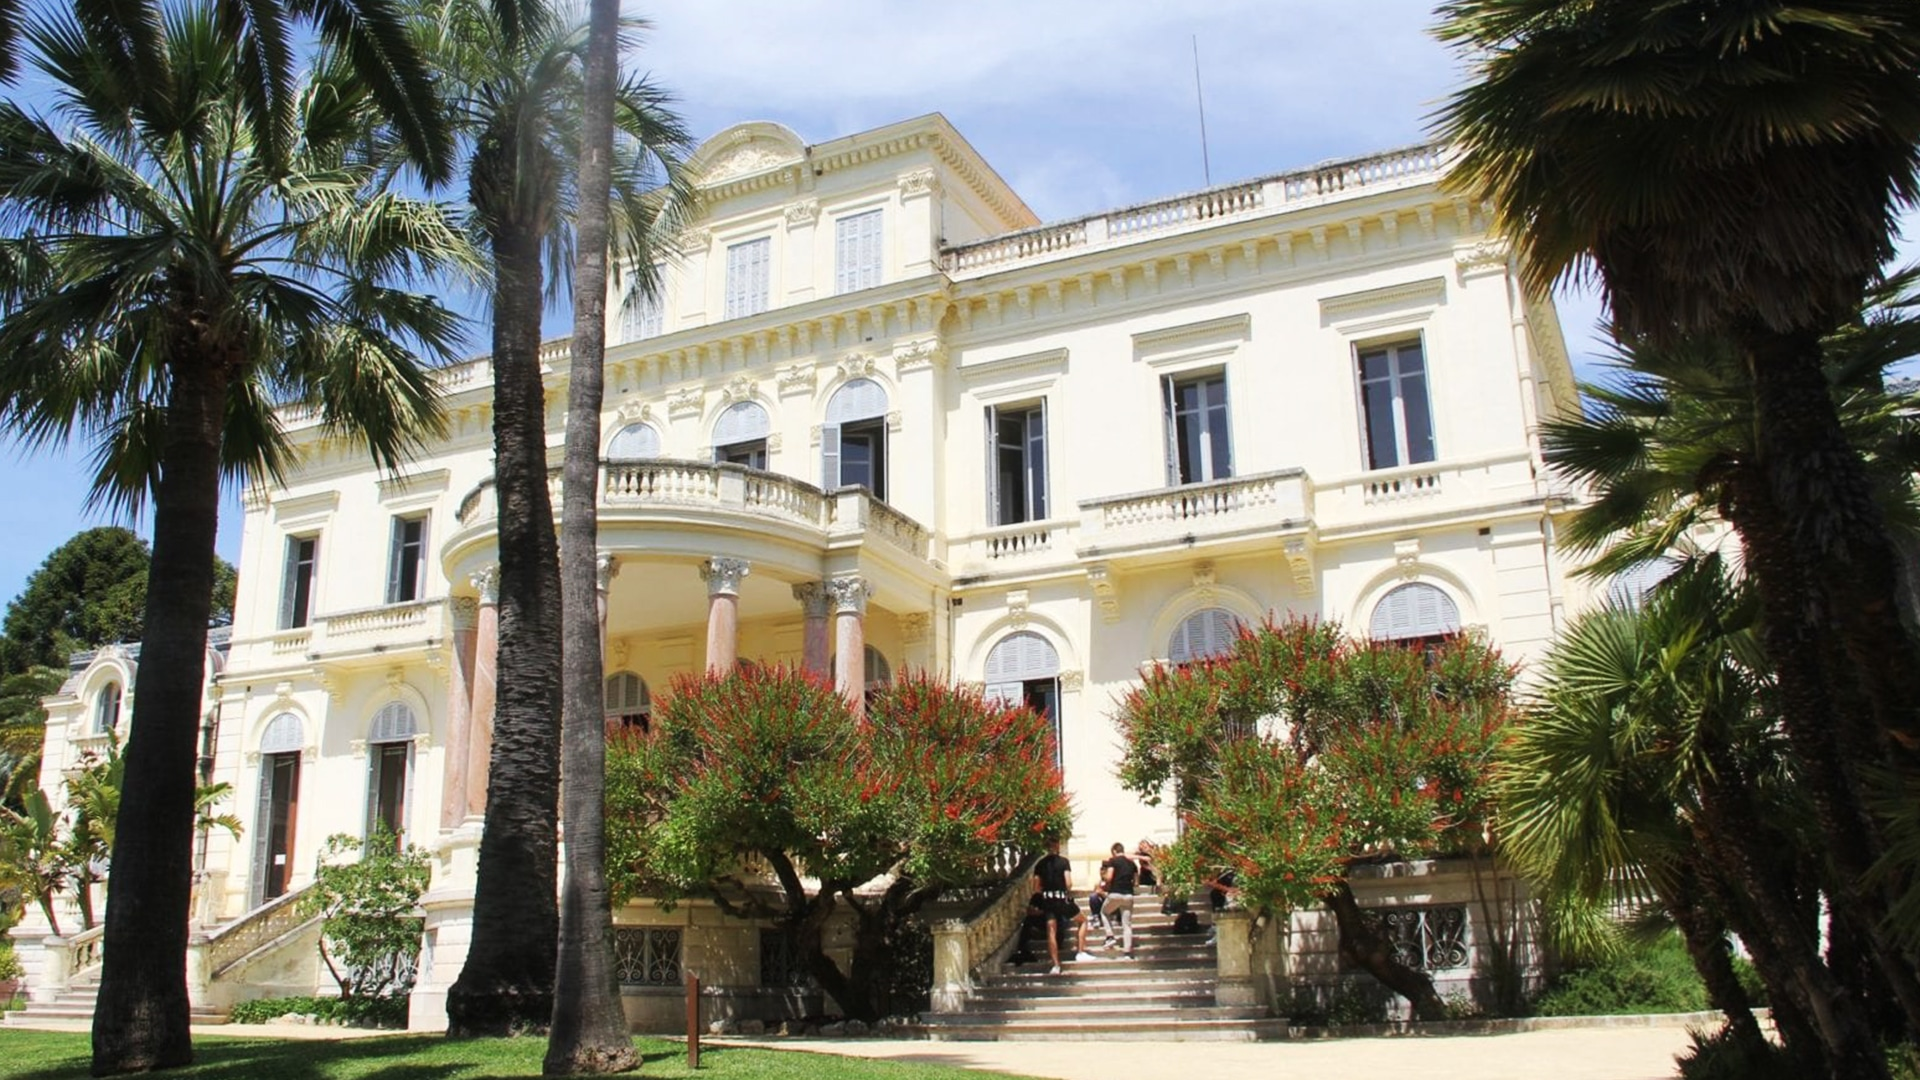 Visiter Cannes : la villa